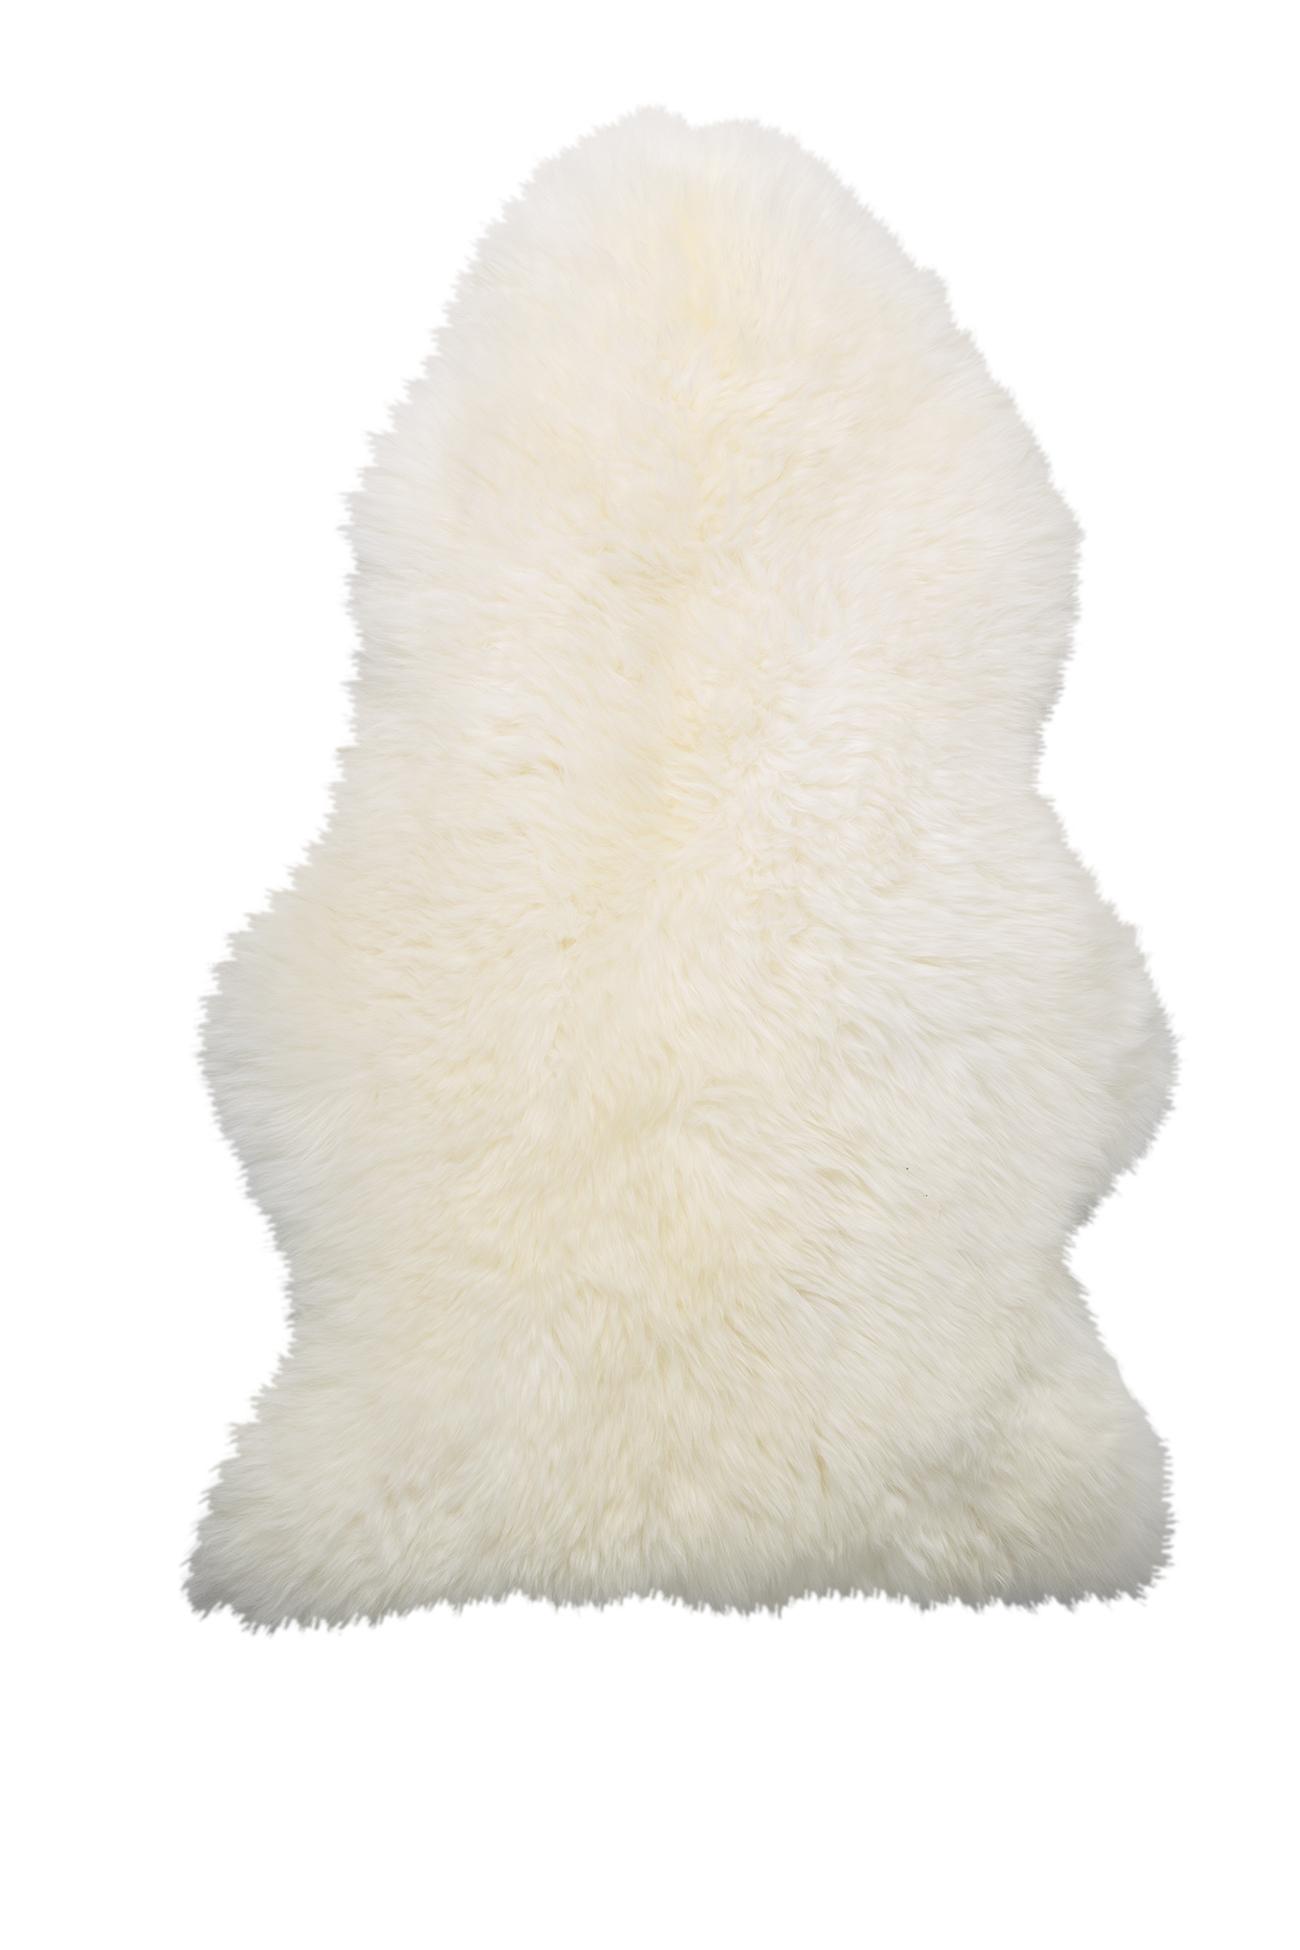 Faux sheepskin rug from Marshalls, $16.99-$19.99